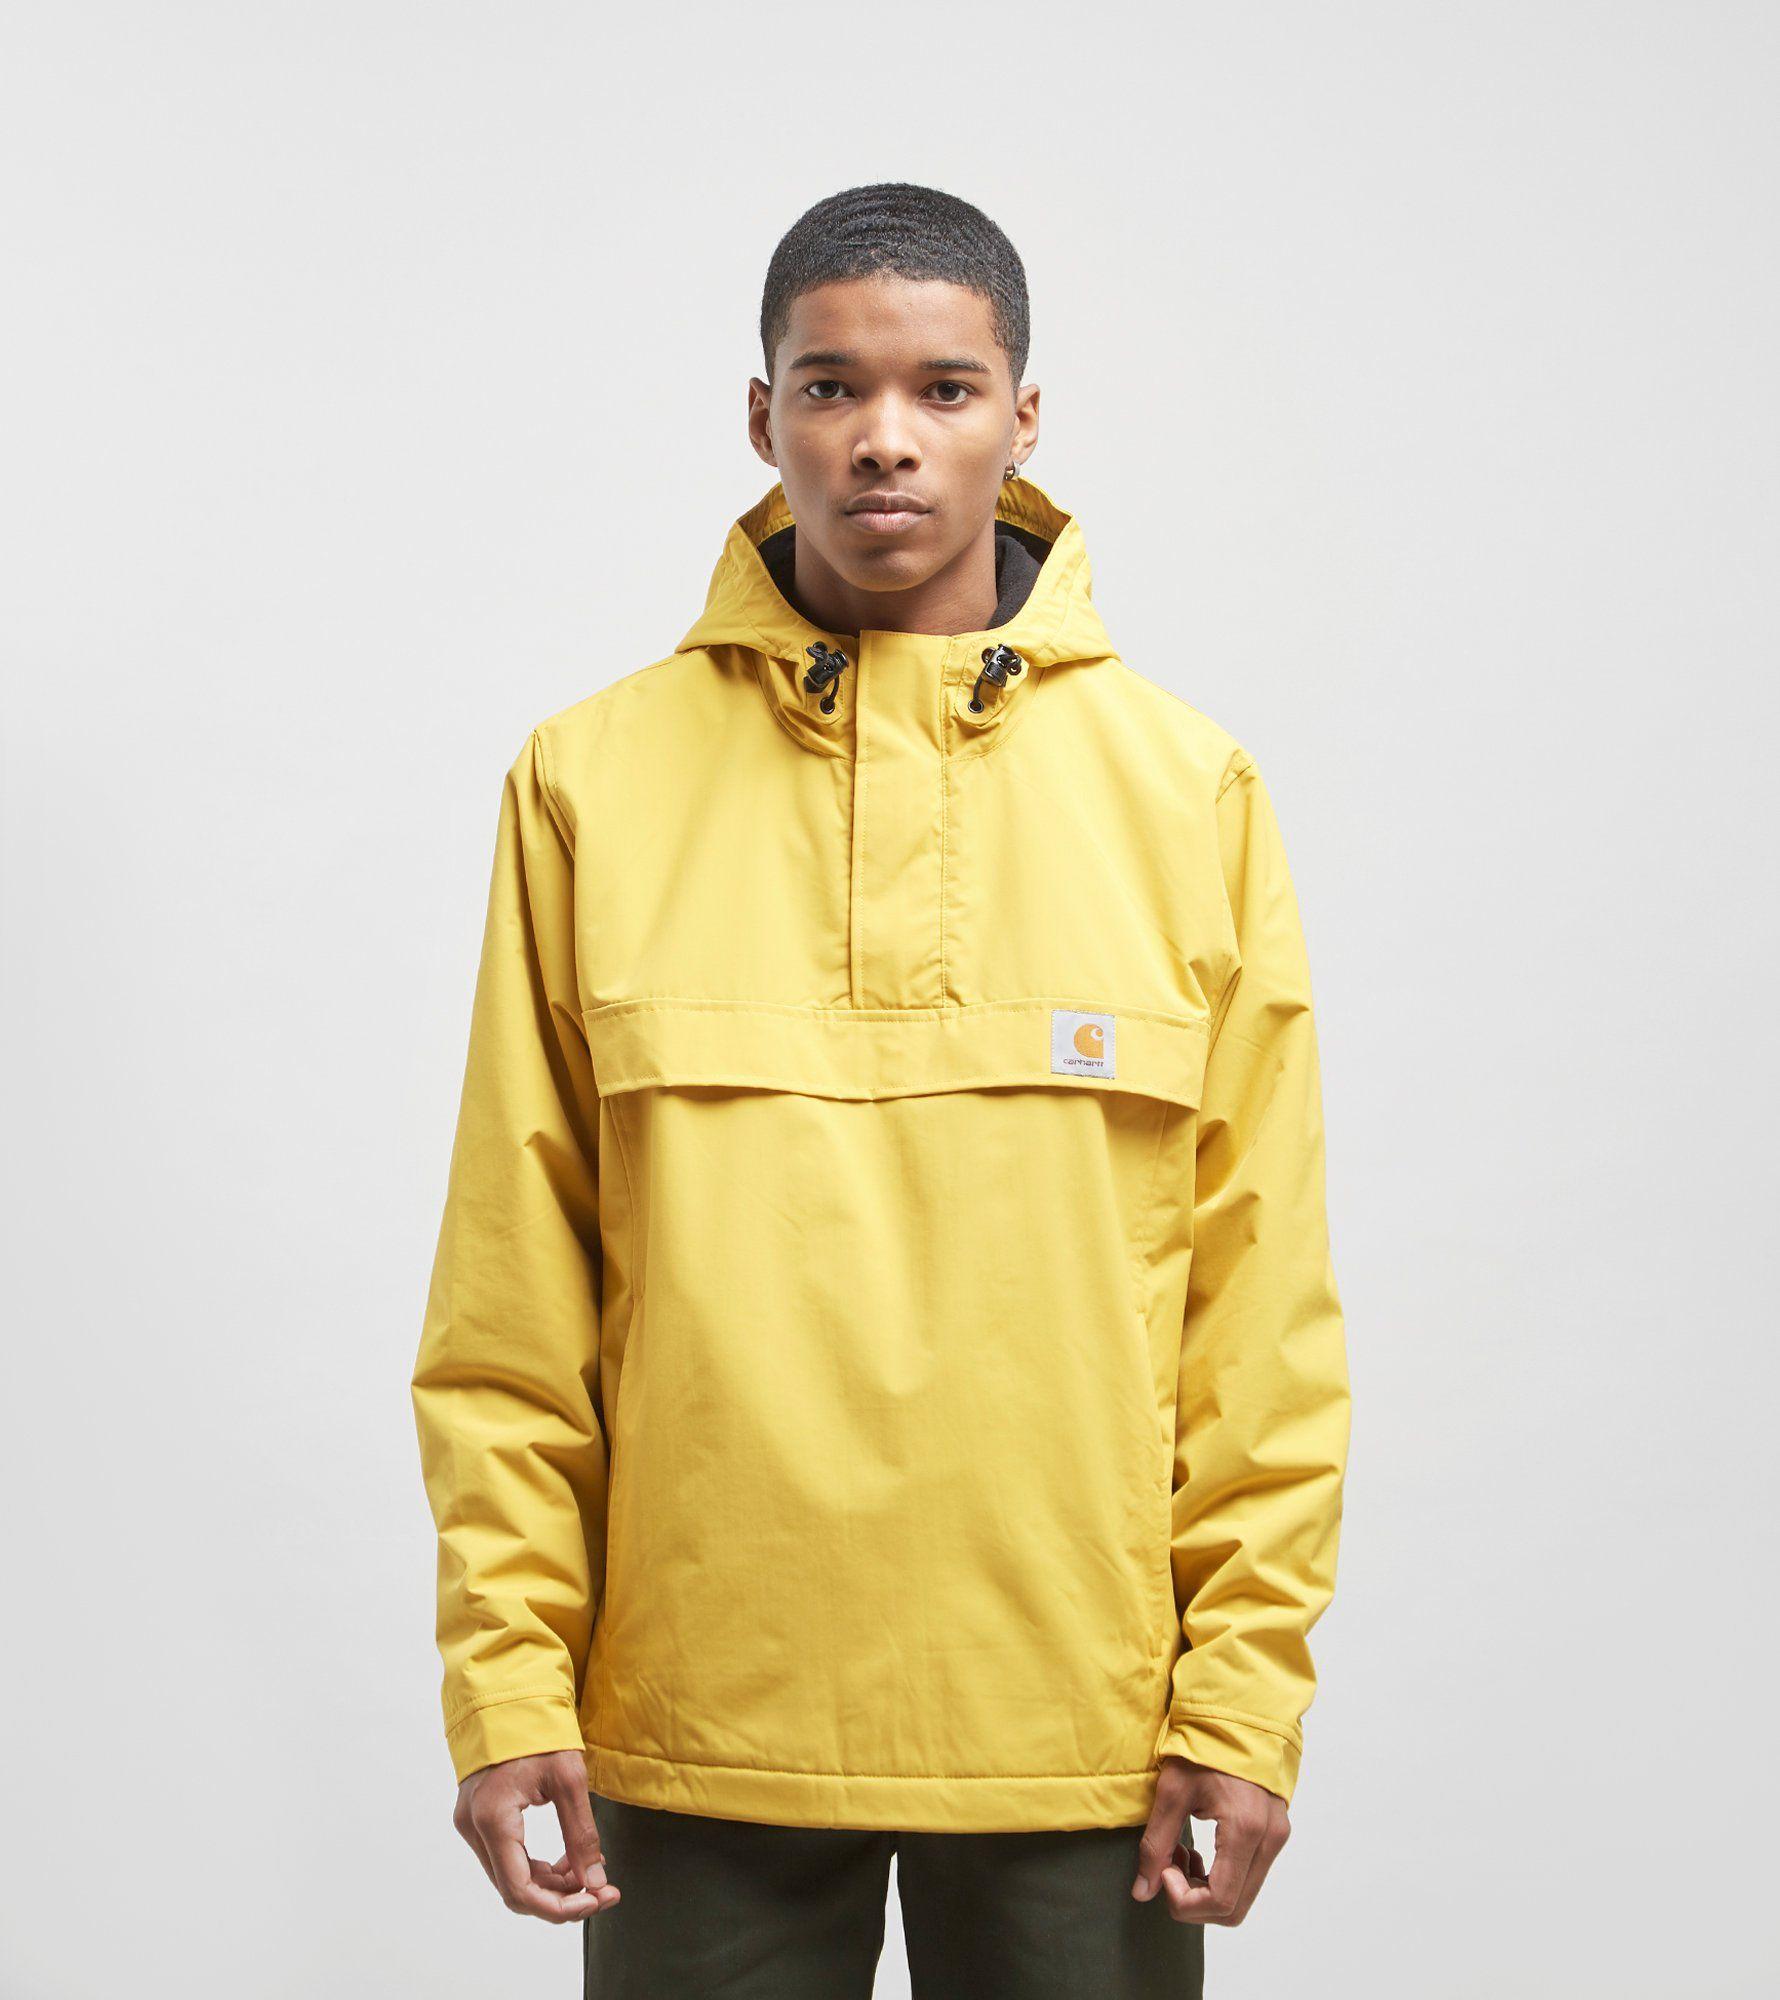 2c13ac95a93 Carhartt WIP Nimbus Pullover Winter Jacket - size? Exclusive | Size? carhartt  nimbus